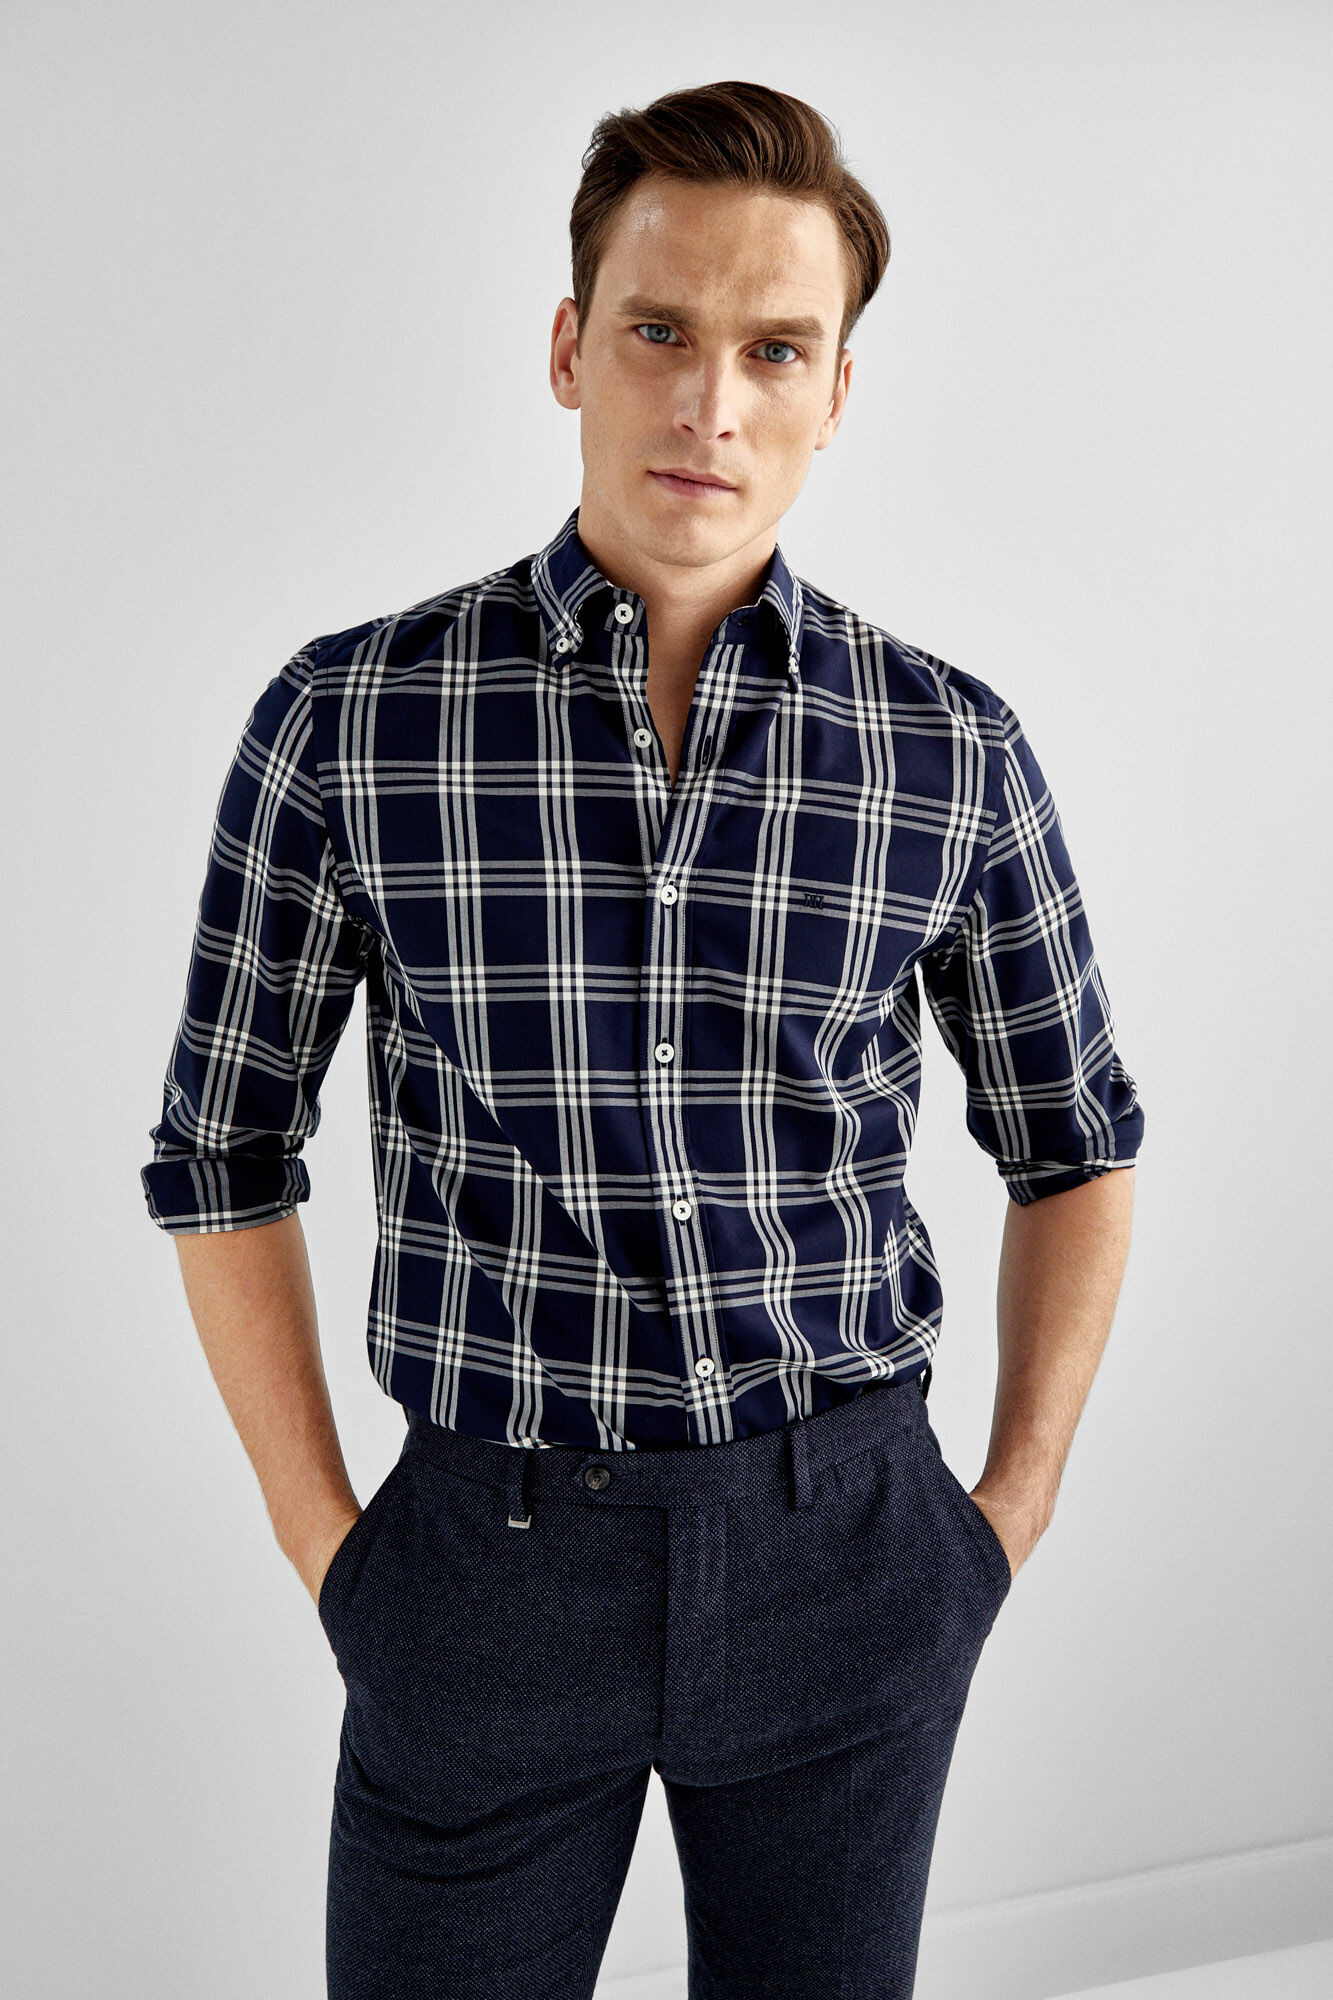 Camisas Hombre Del De Hierro Pedro zrSHzqwx